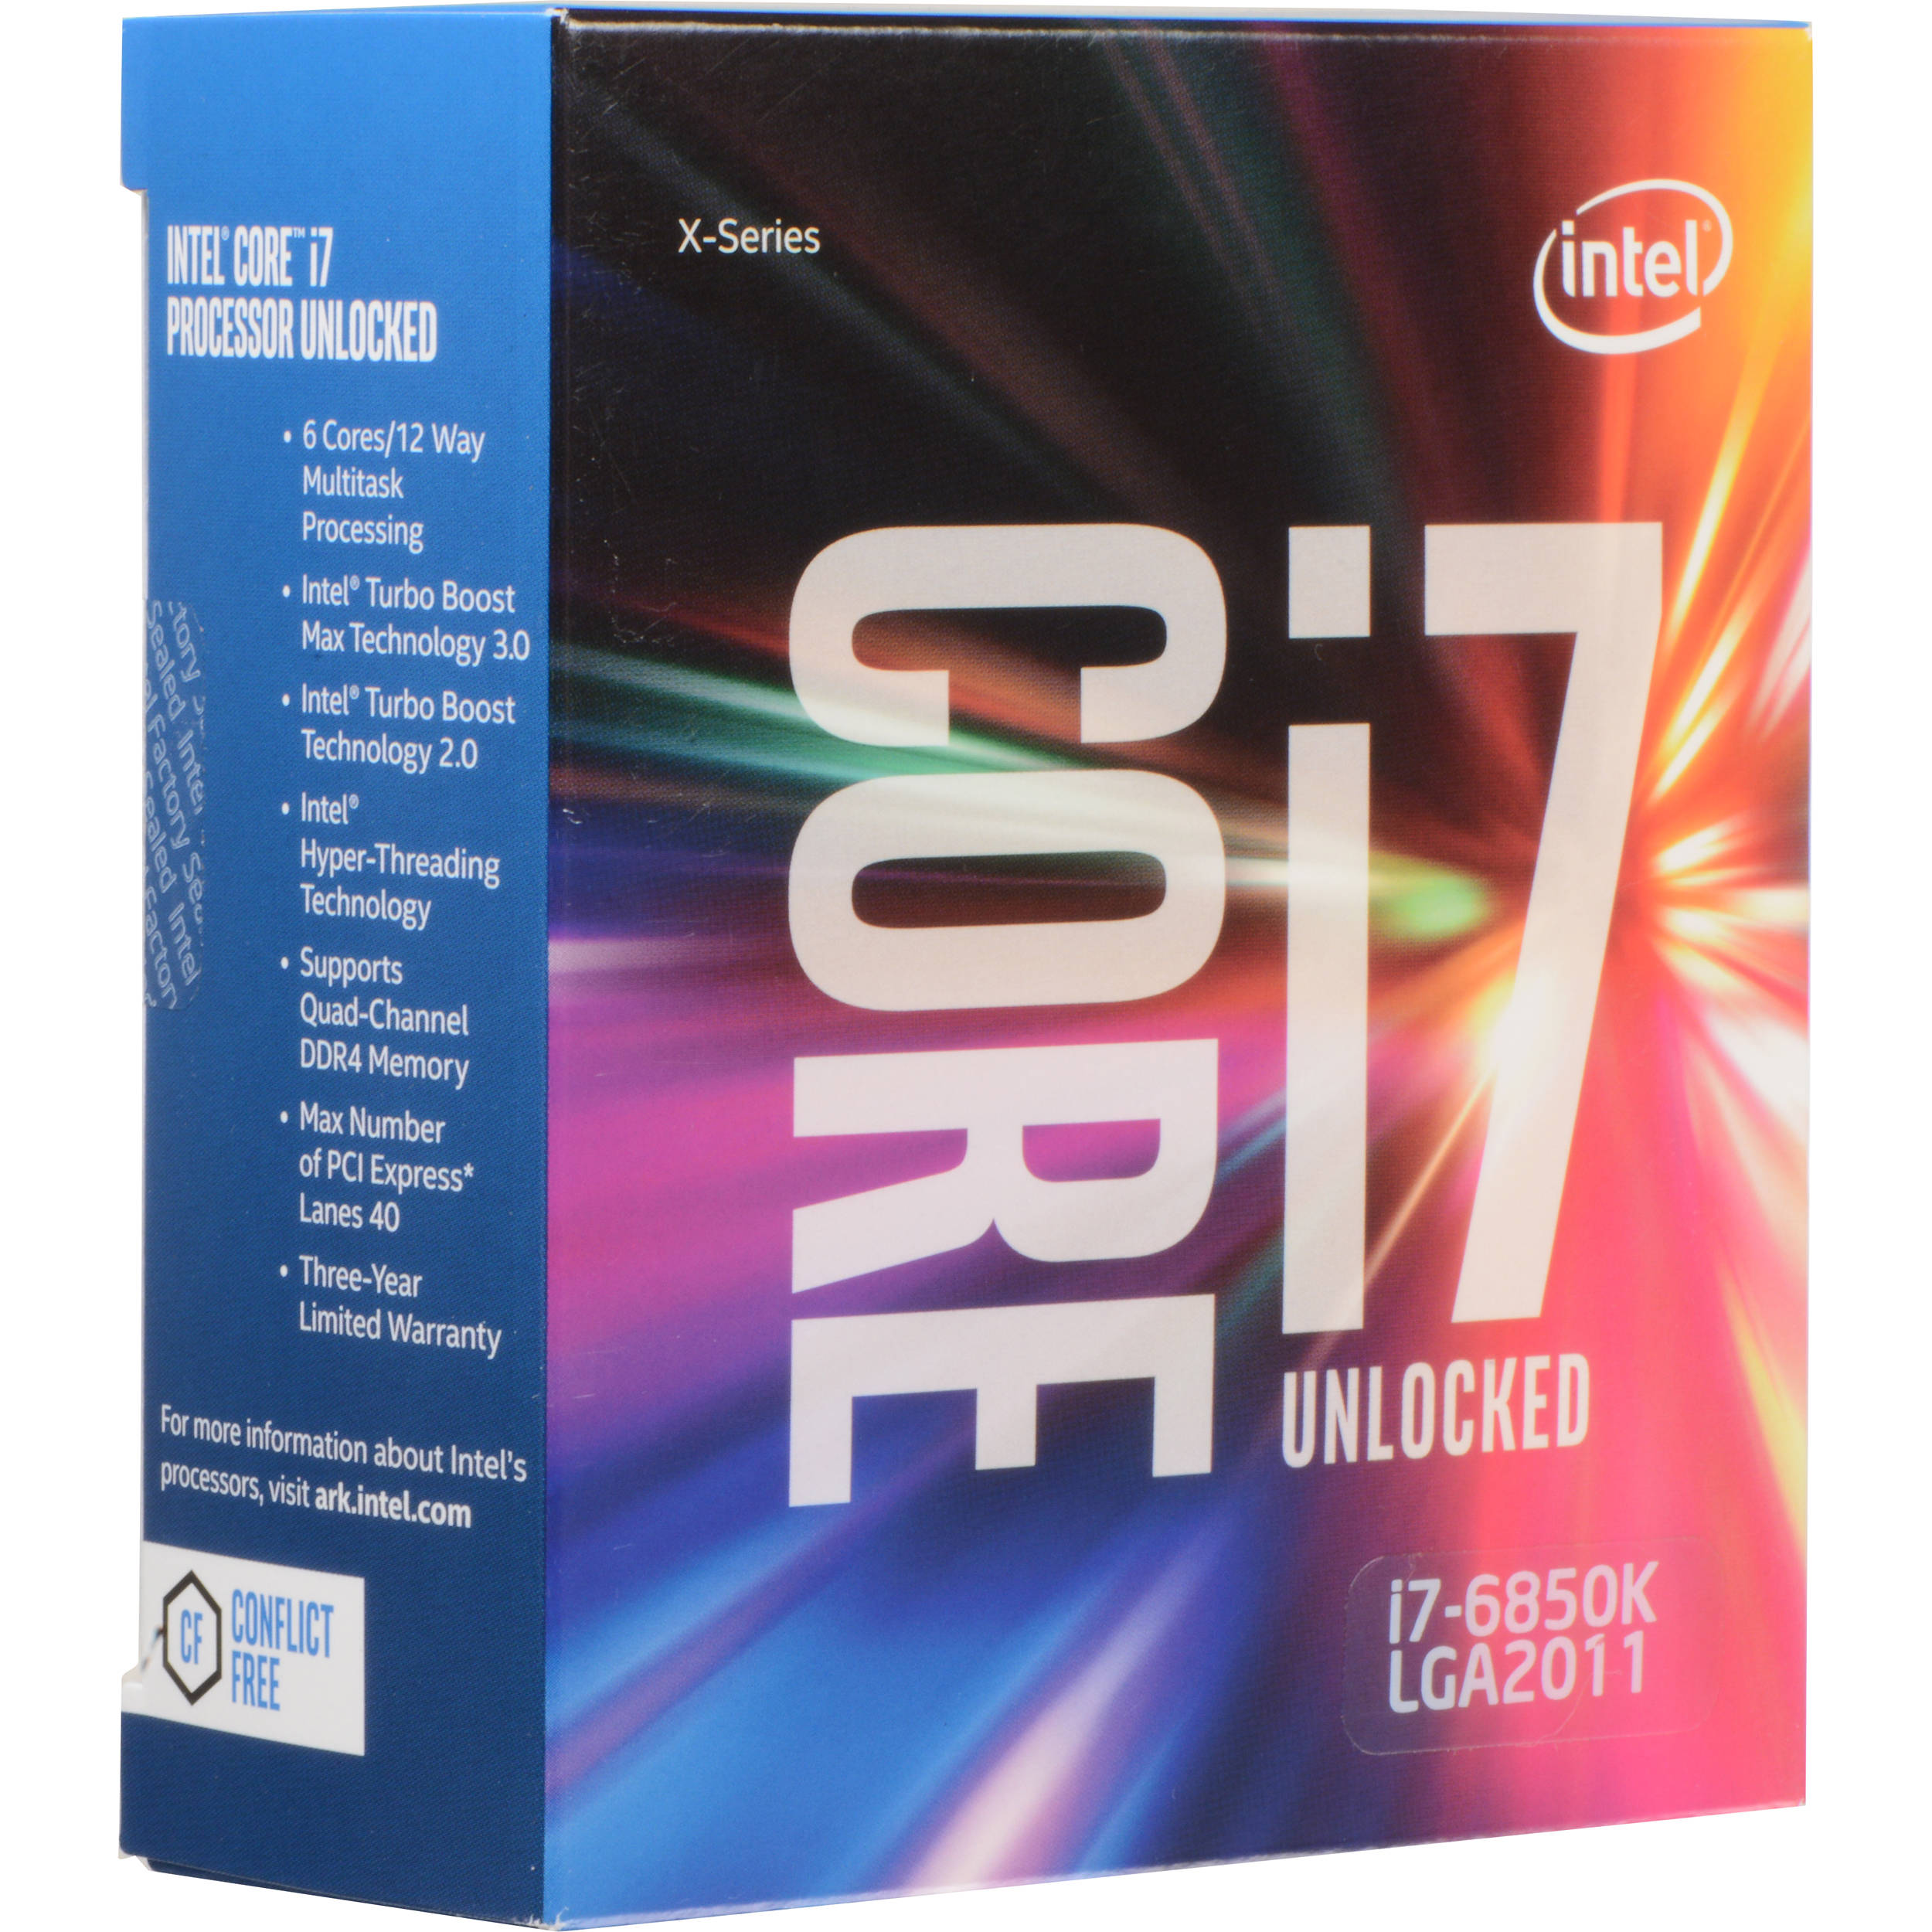 CPU INTEL CORE I7-6850K 3.60GHZ 15MB LGA 2011-V3 SEM COOLER